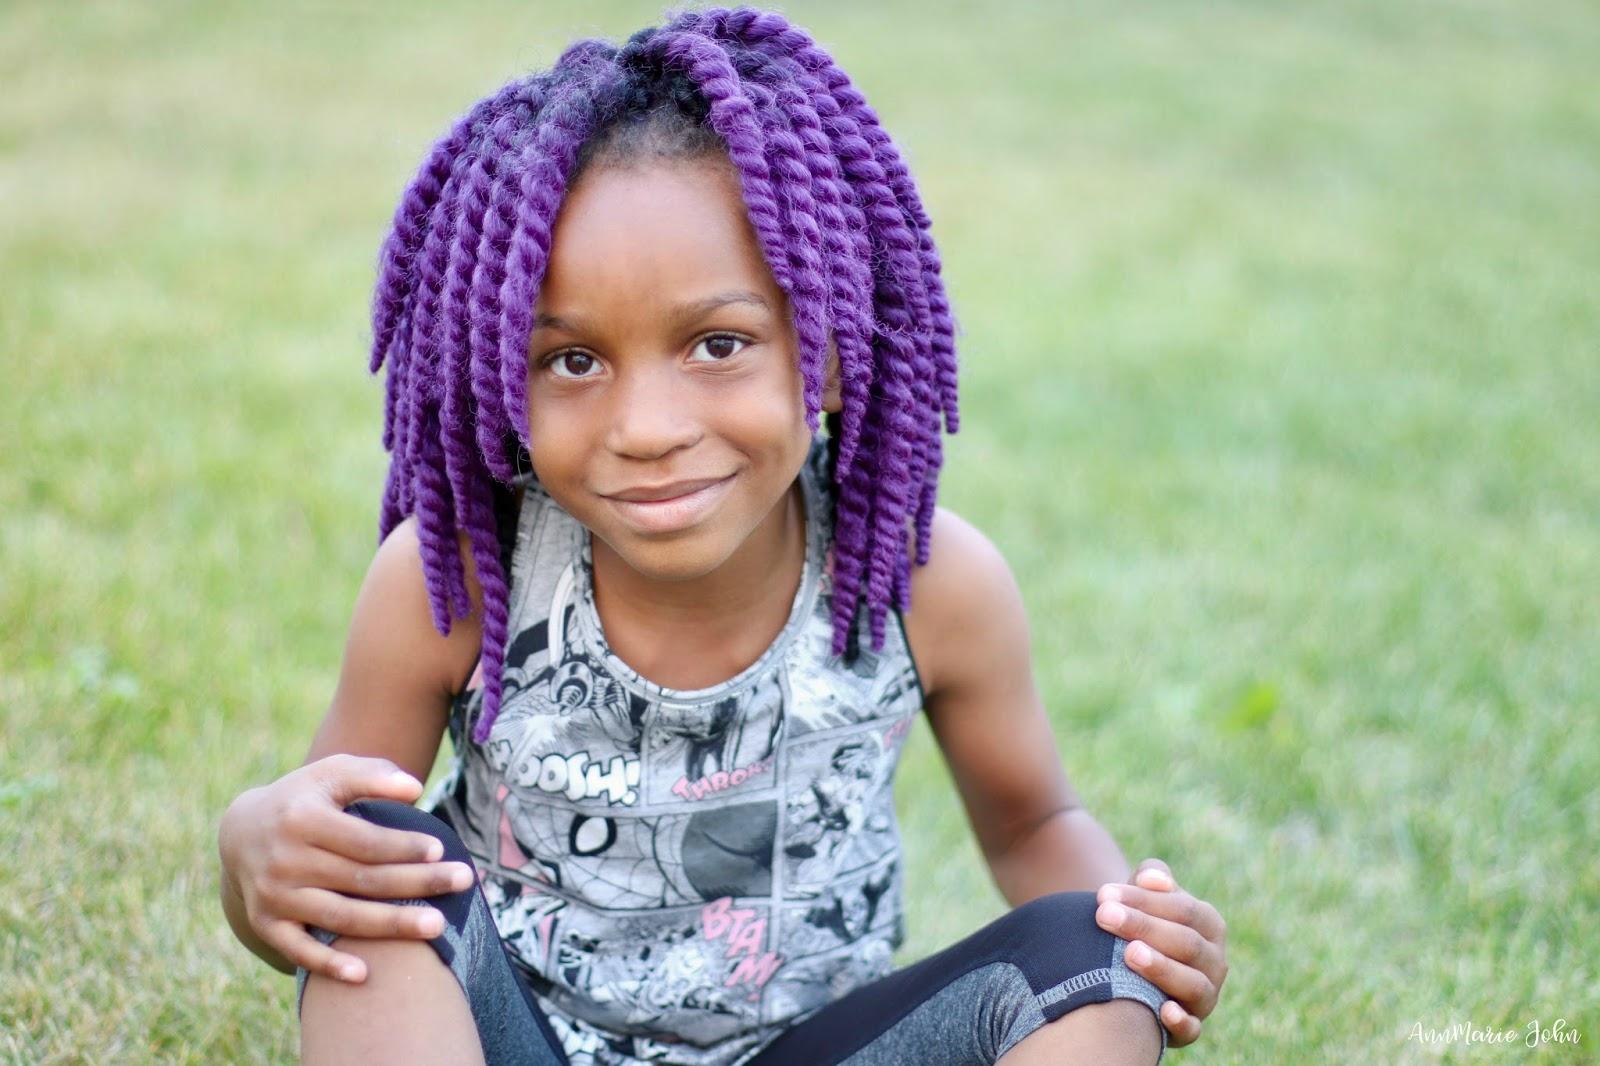 Introducing Yoga to Kids - #GapFitMarvel